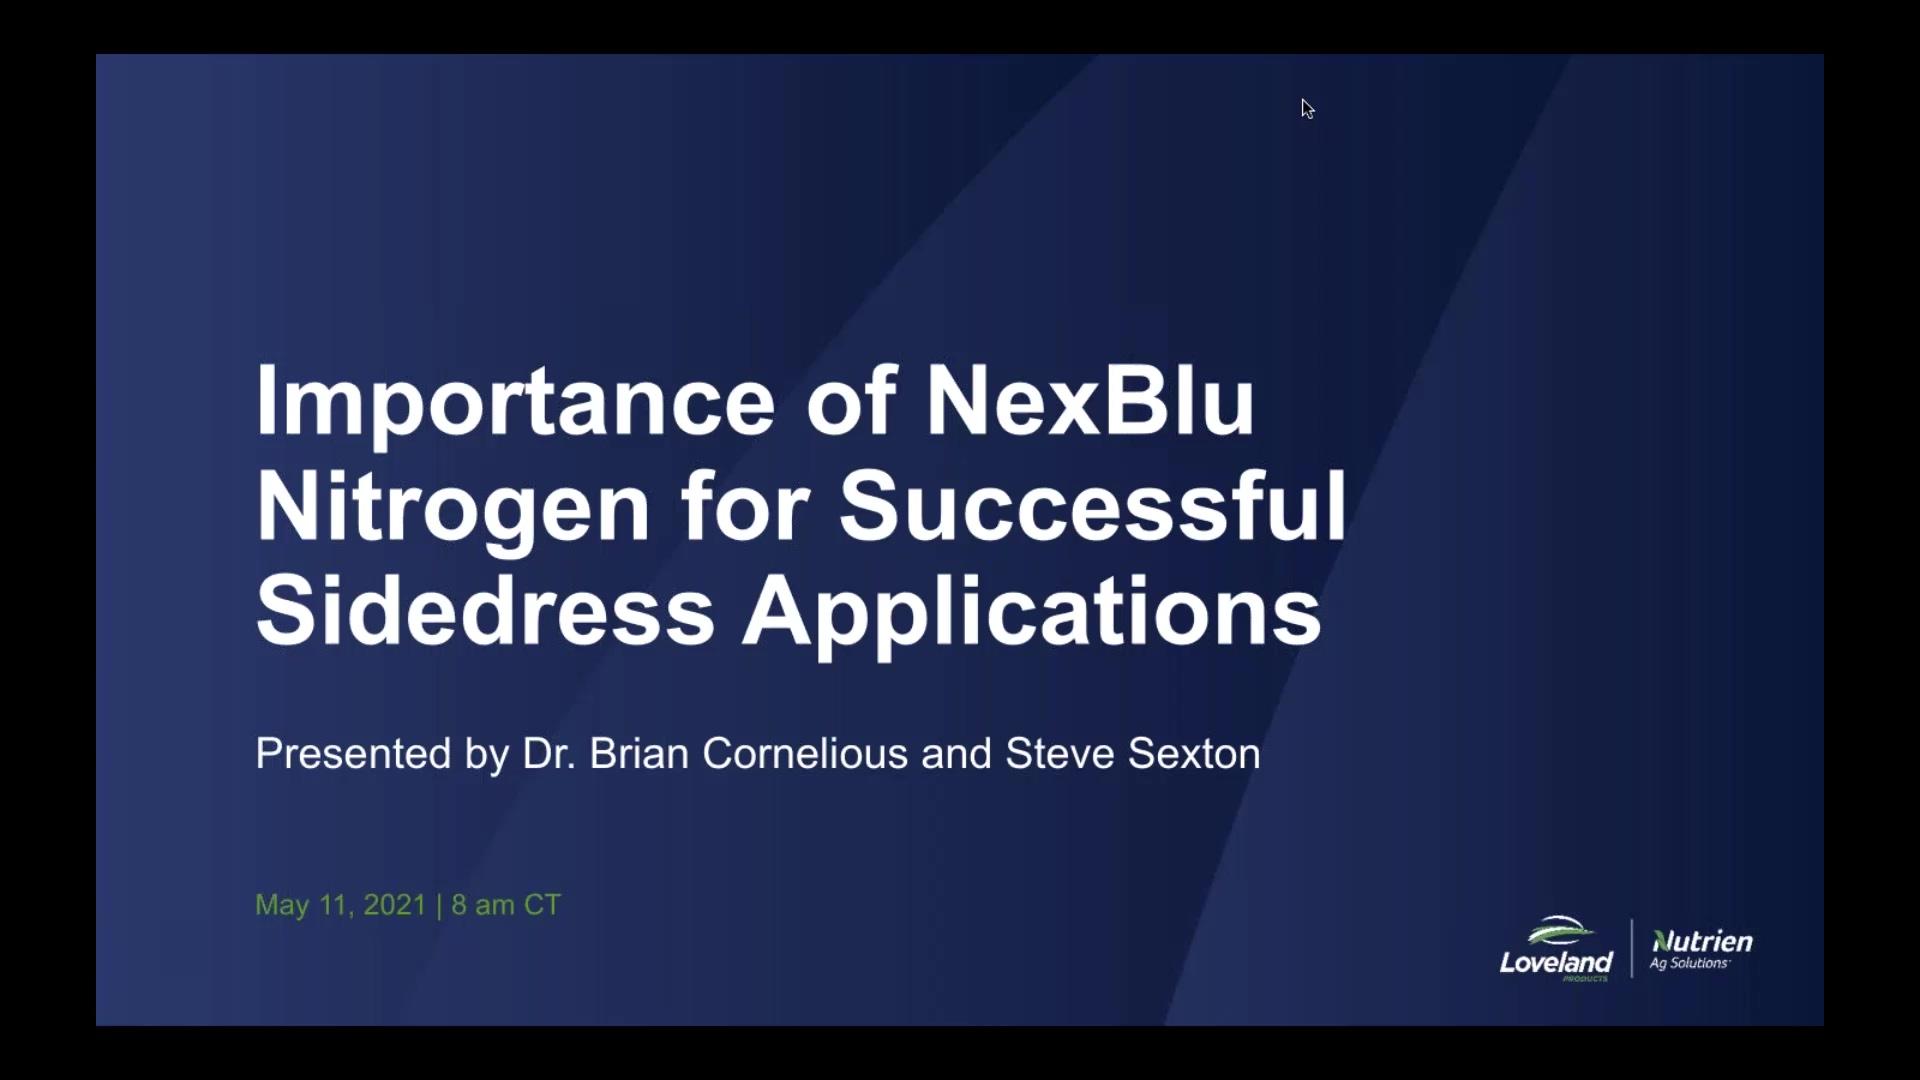 Importance of NexBlu Nitrogen for Successful Sidedress